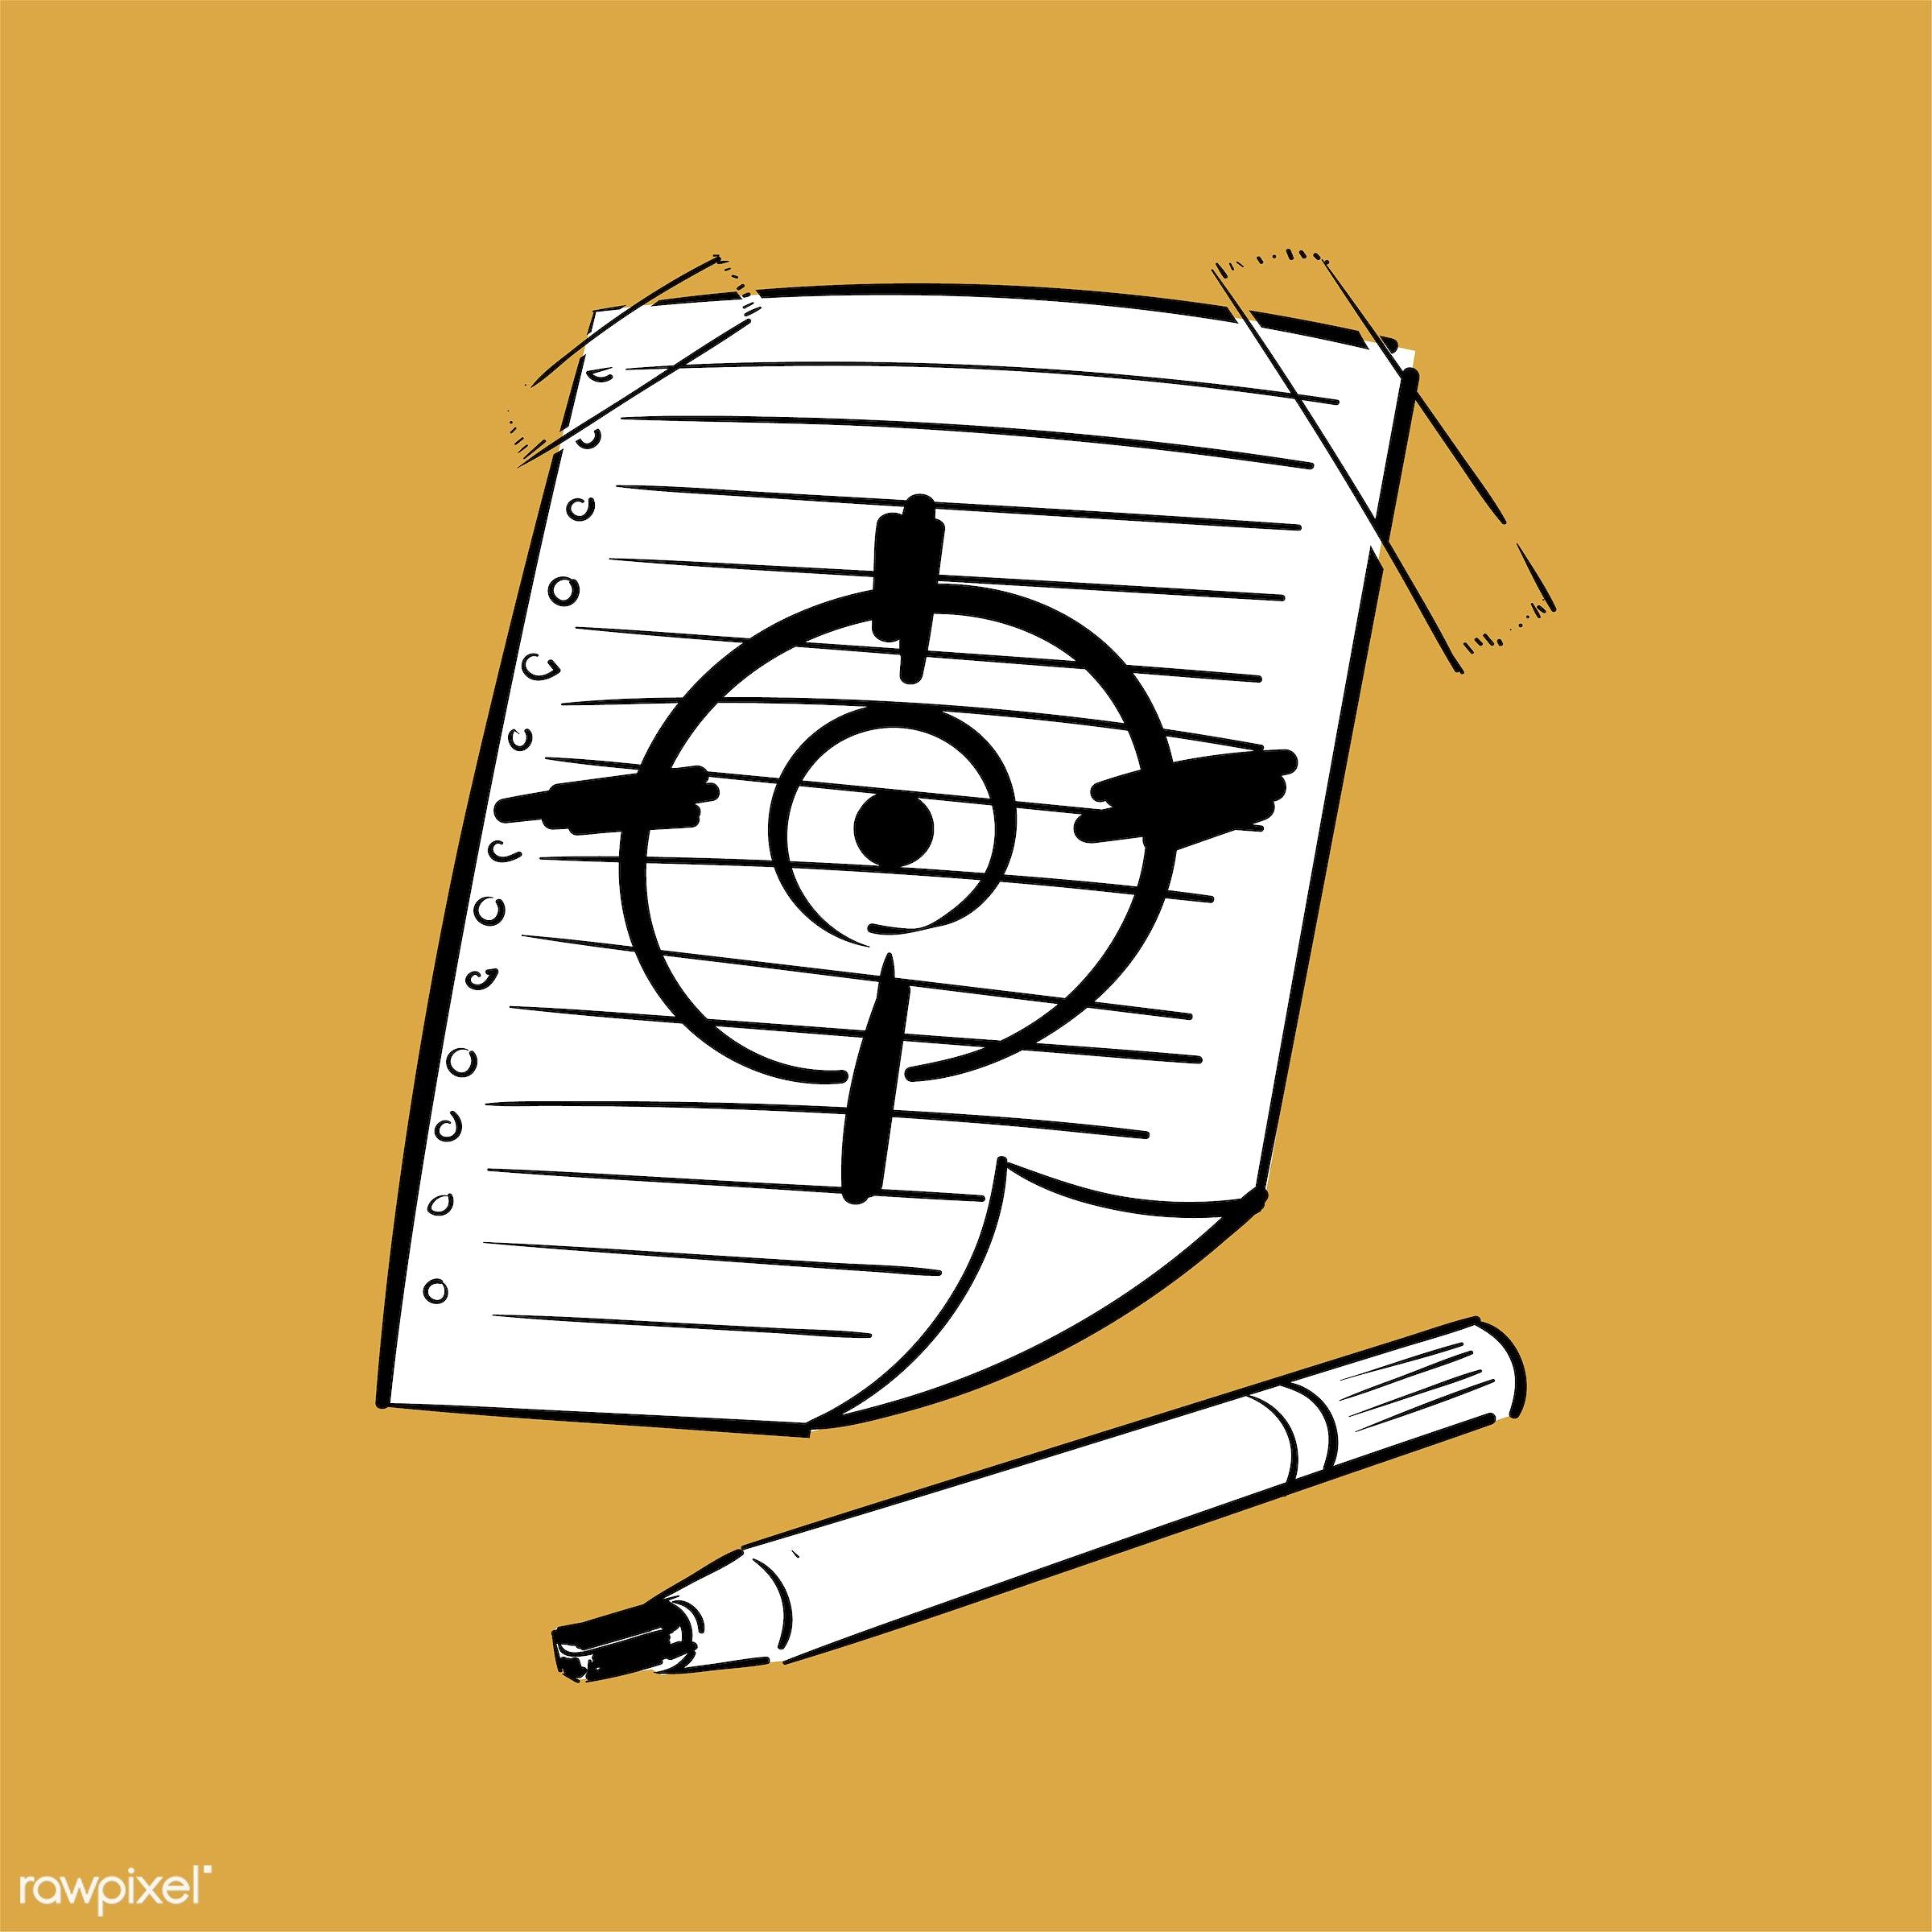 achievement, aim, art, artwork, business, challenge, collection, creative, creativity, design, draw, drawing, drawn, focus,...